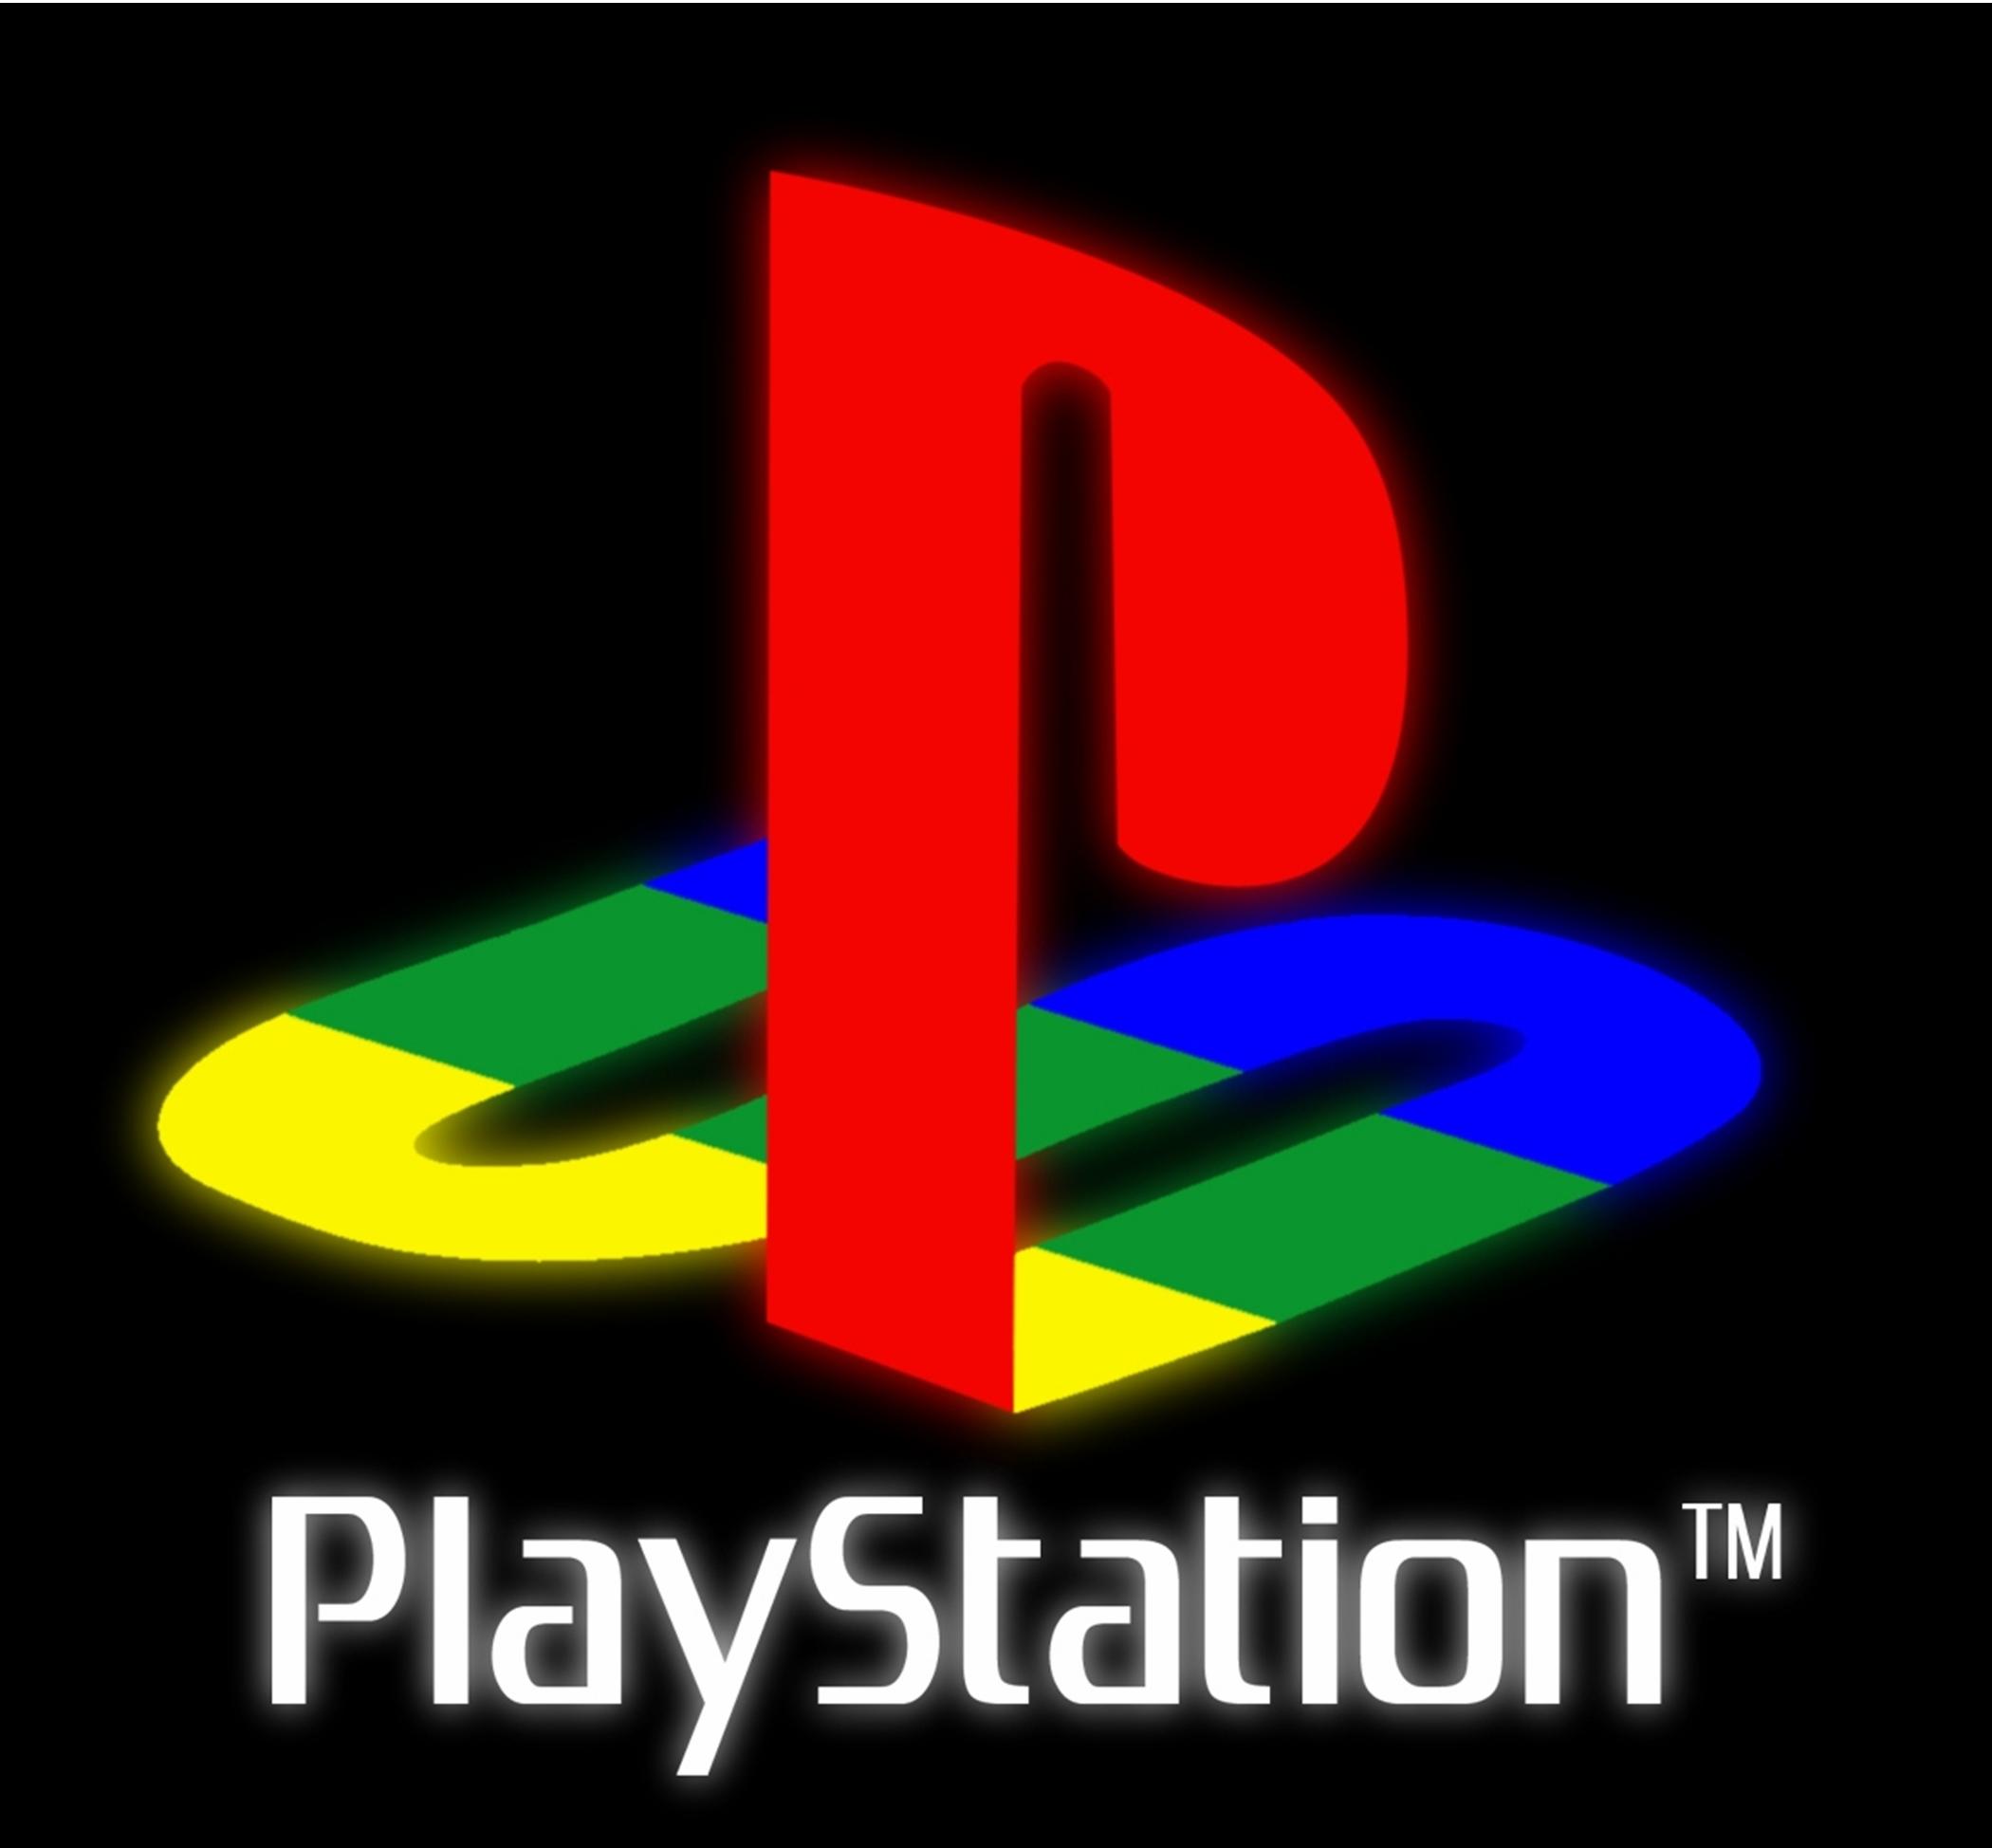 Playstation Credit Card Payment Login Address Customer Service